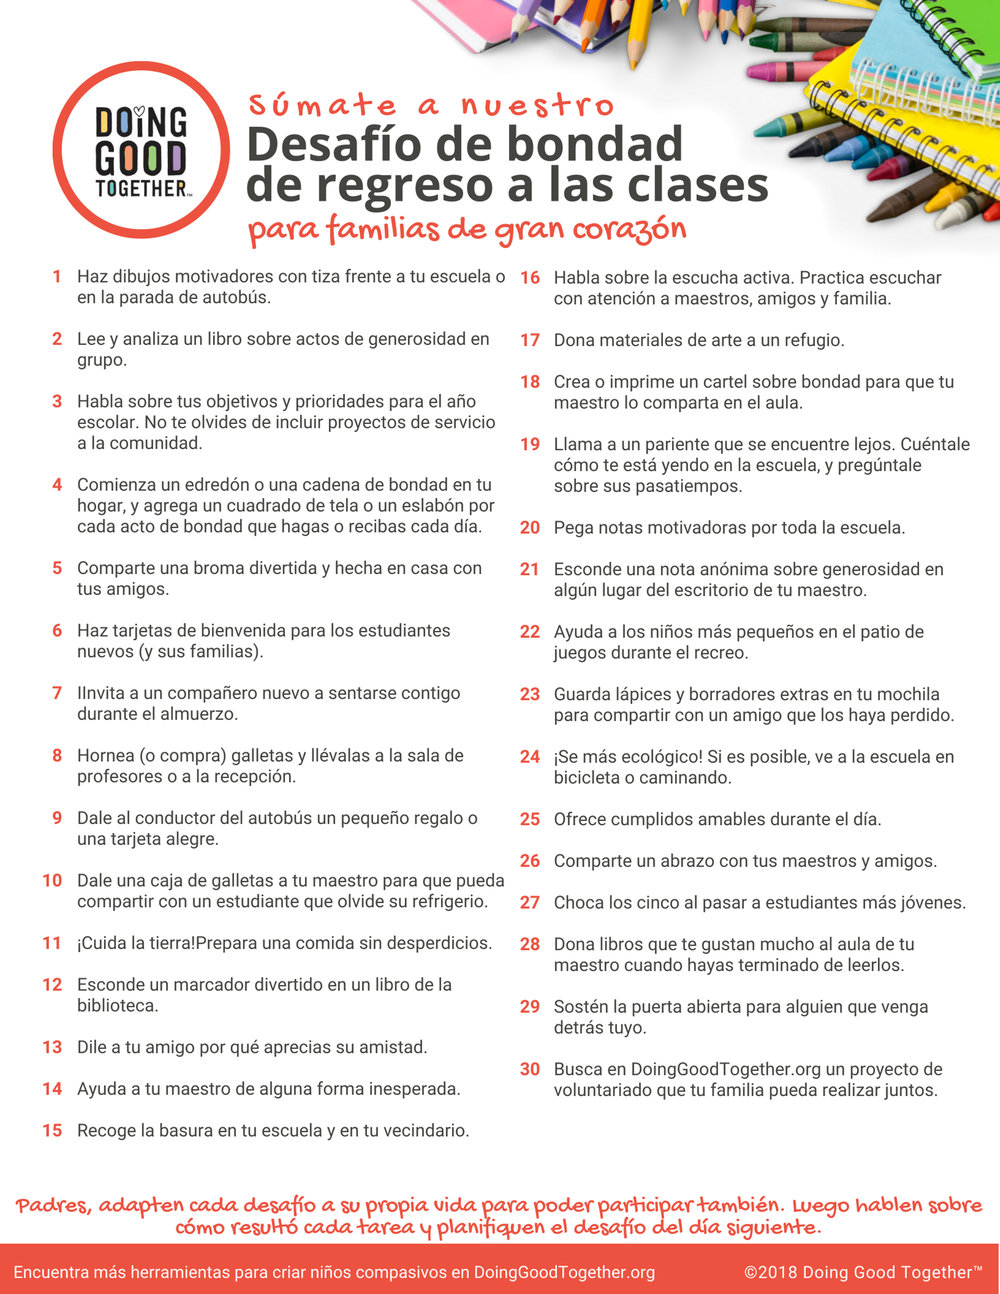 NEW! en español